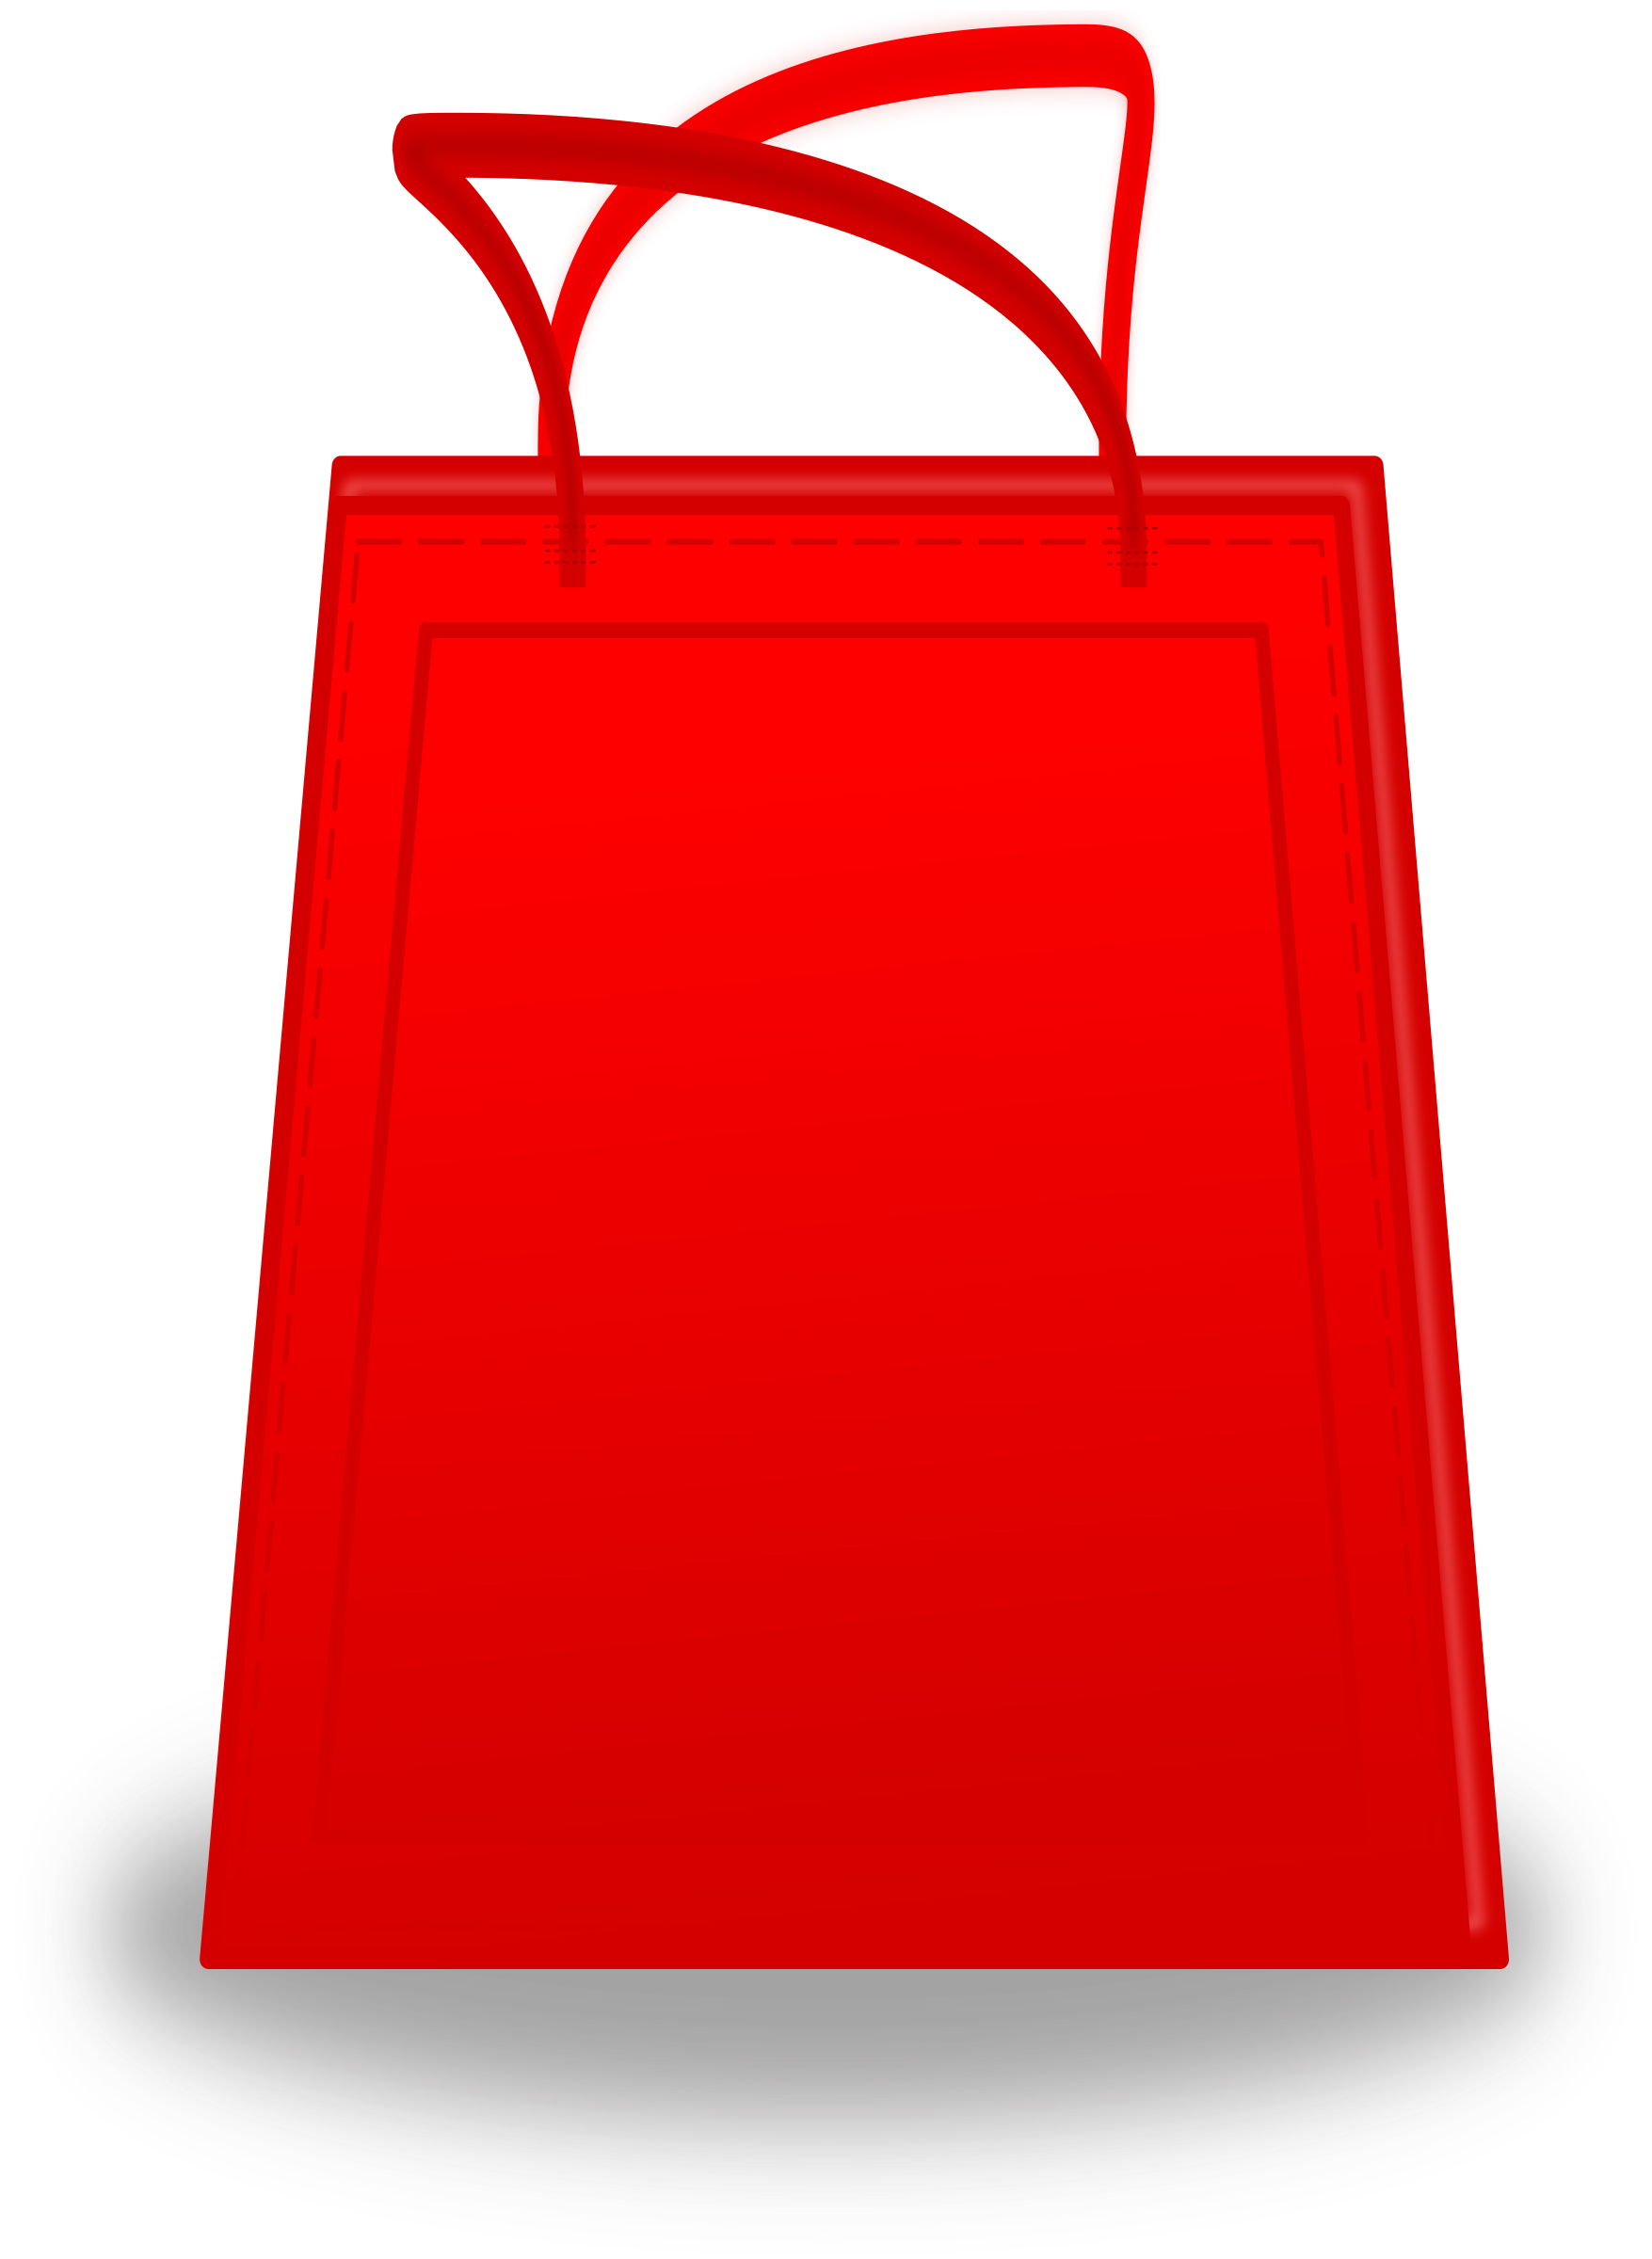 Bag clipart rectangle Bag Shopping Clipart Shopping Bag